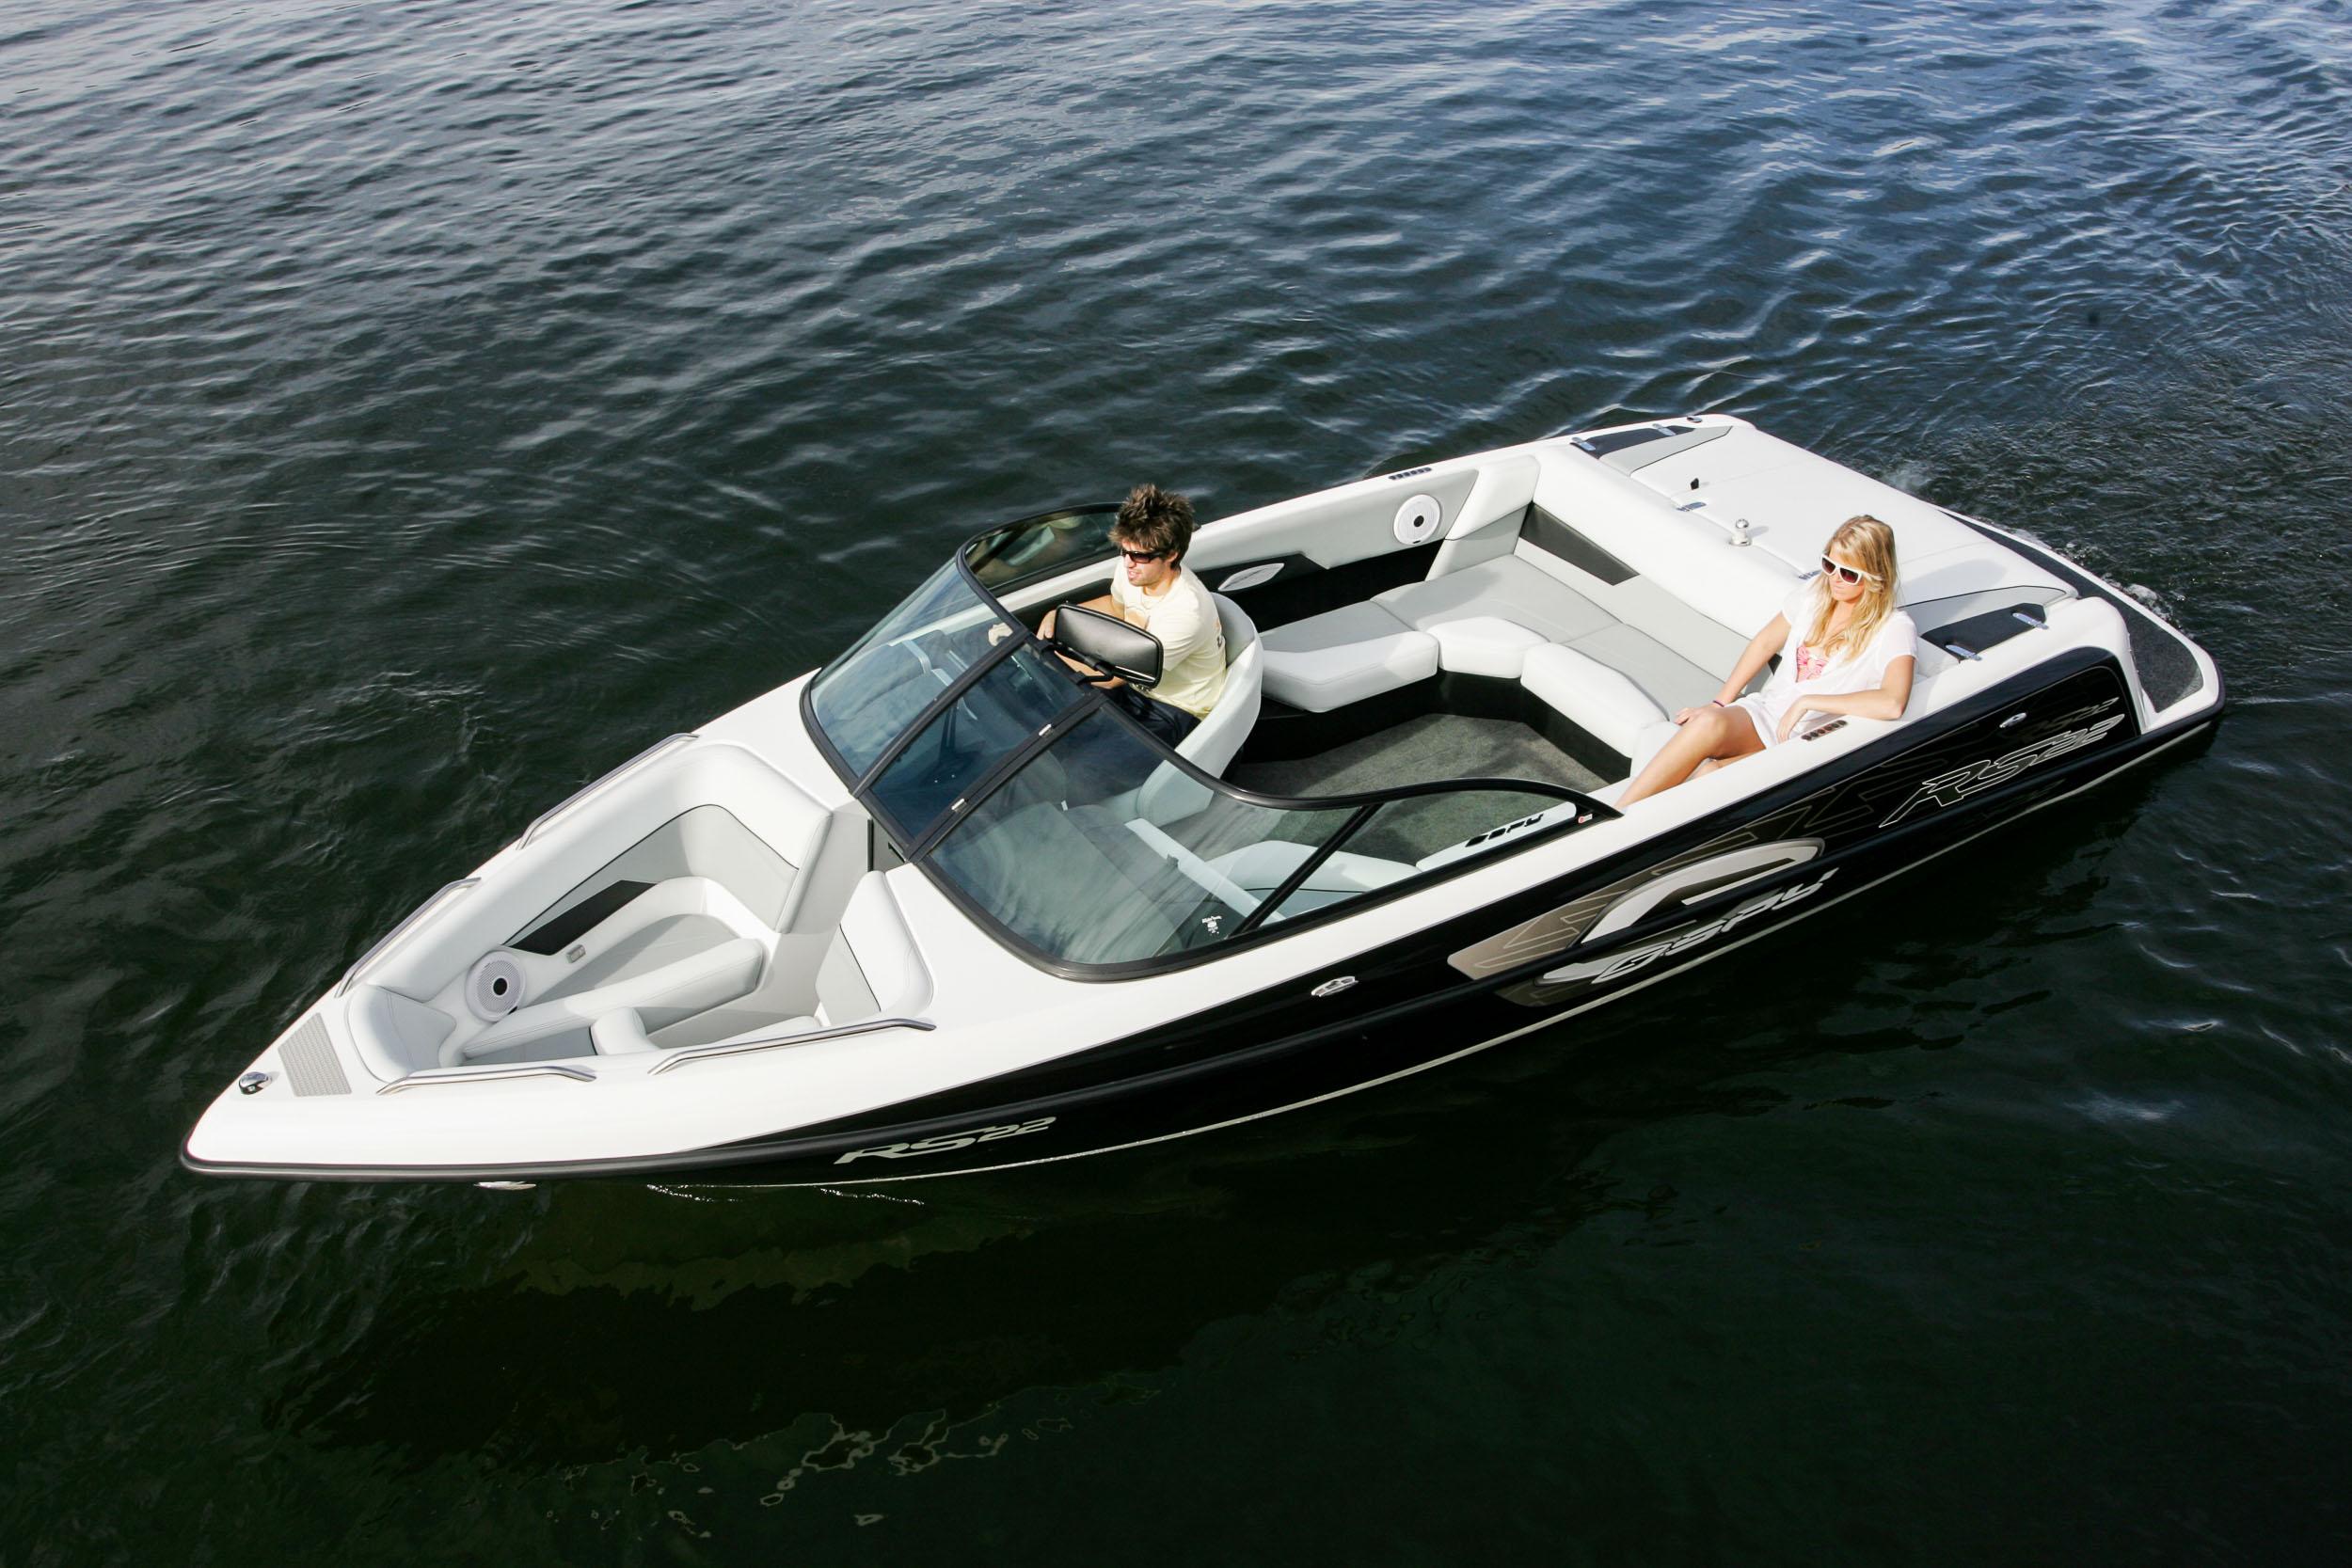 Spy_Boats_RS22-14.jpg